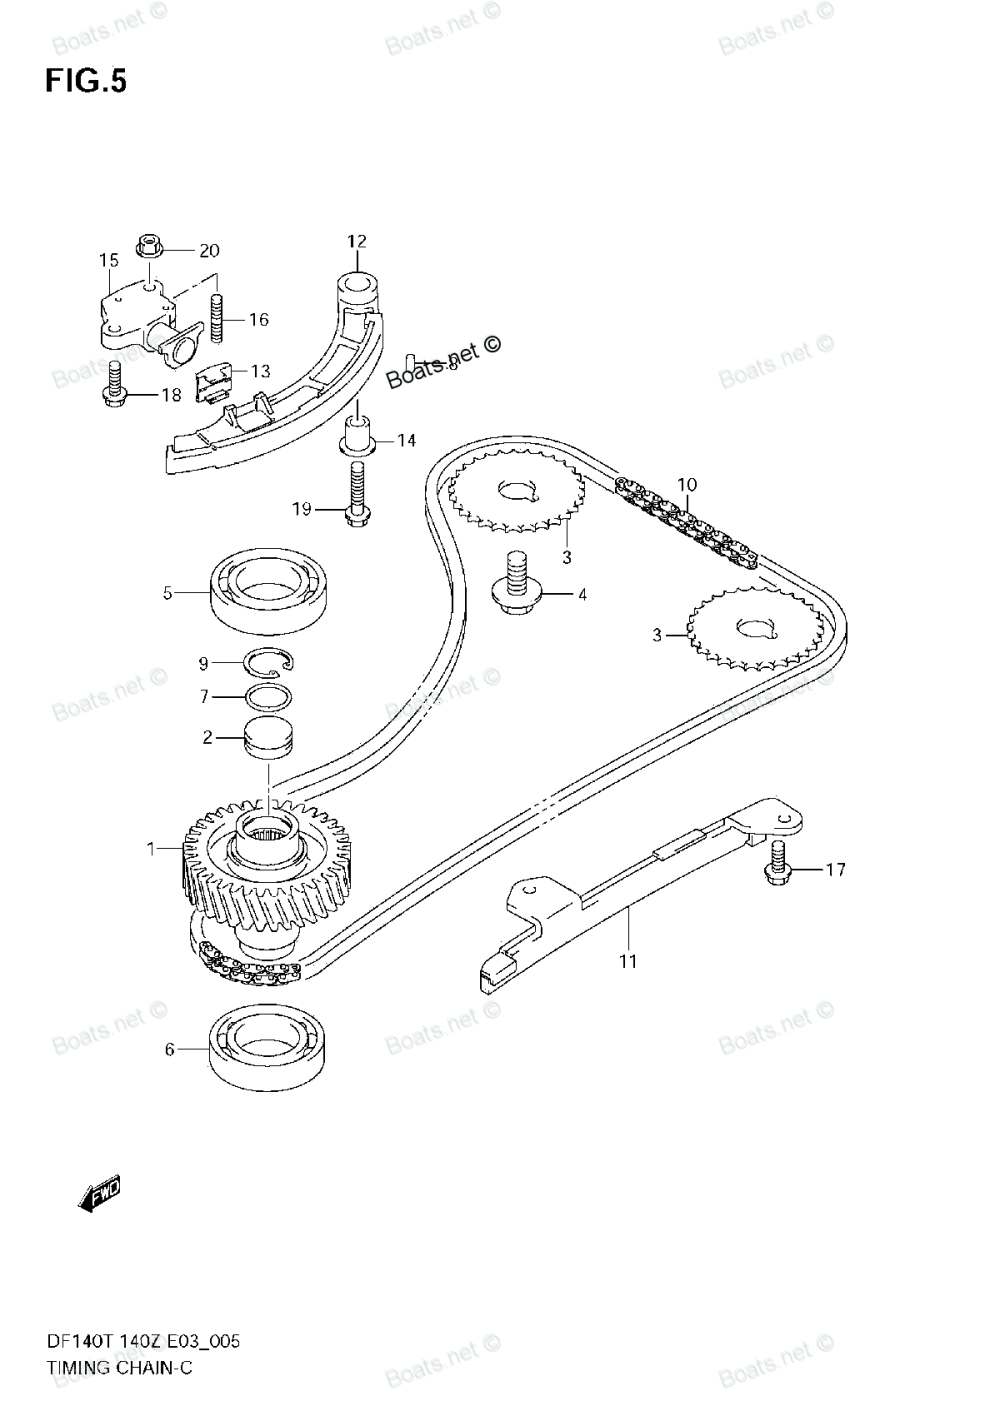 medium resolution of 2003 ford taurus engine diagram of timing chain